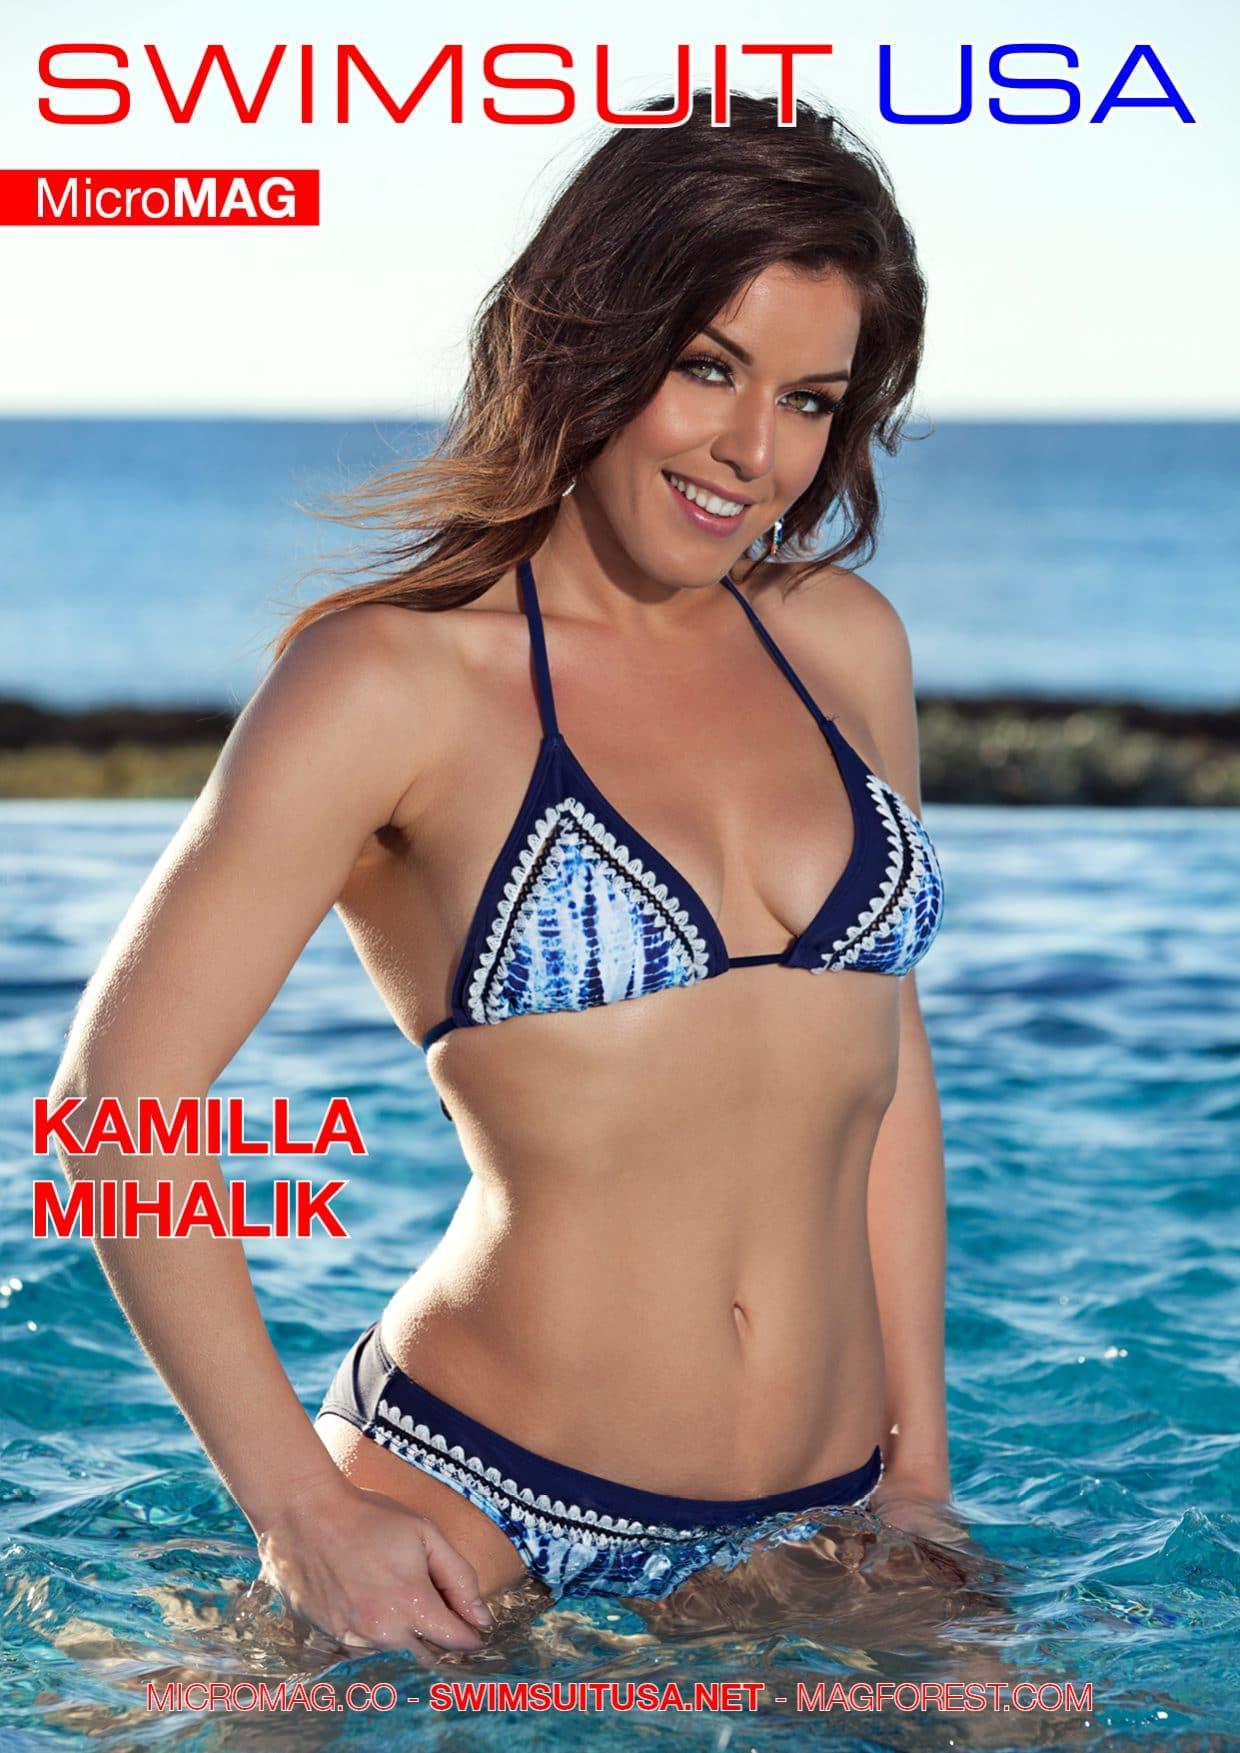 Swimsuit Usa Micromag – Kamilla Mihalik